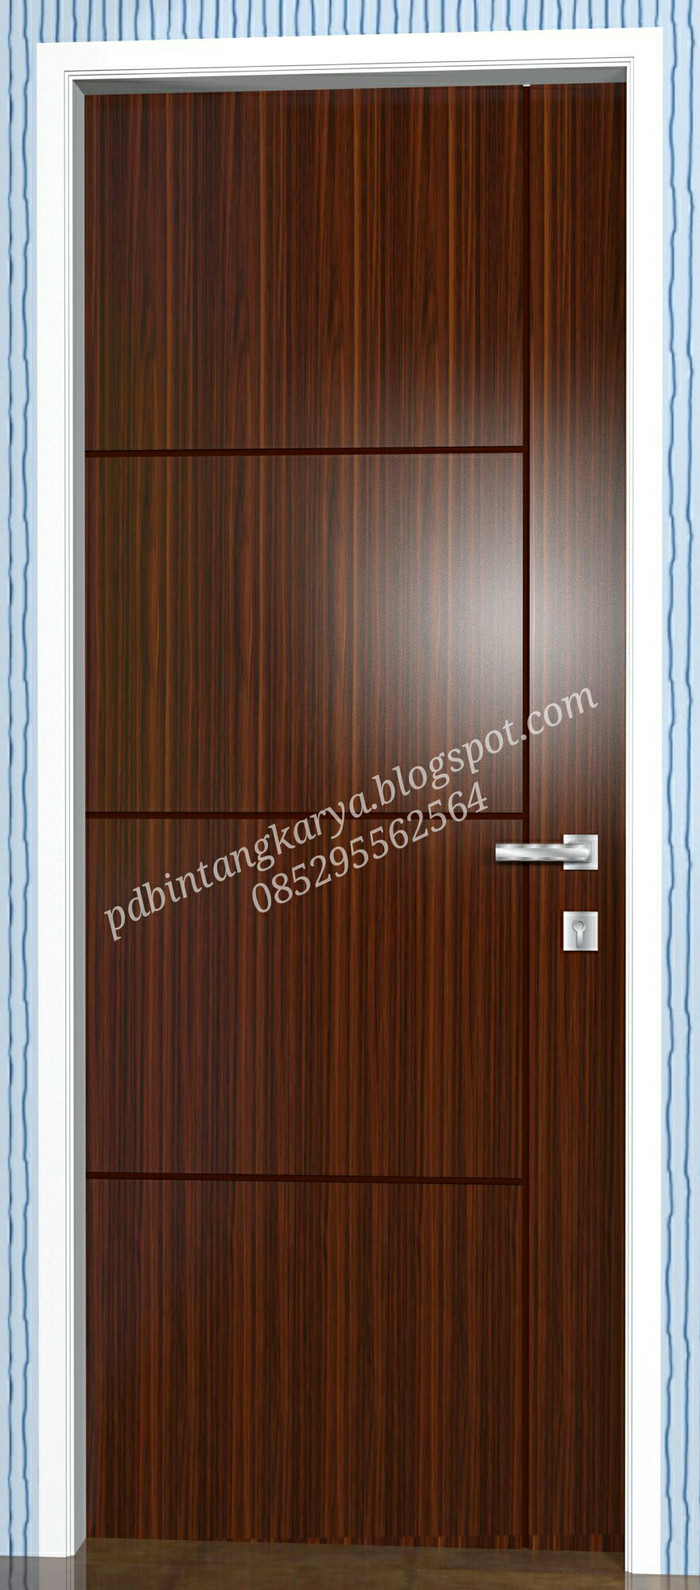 Jual Pintu HPL 80x210 (PH 2) = 2 Daun - Jakarta Timur - PD ...